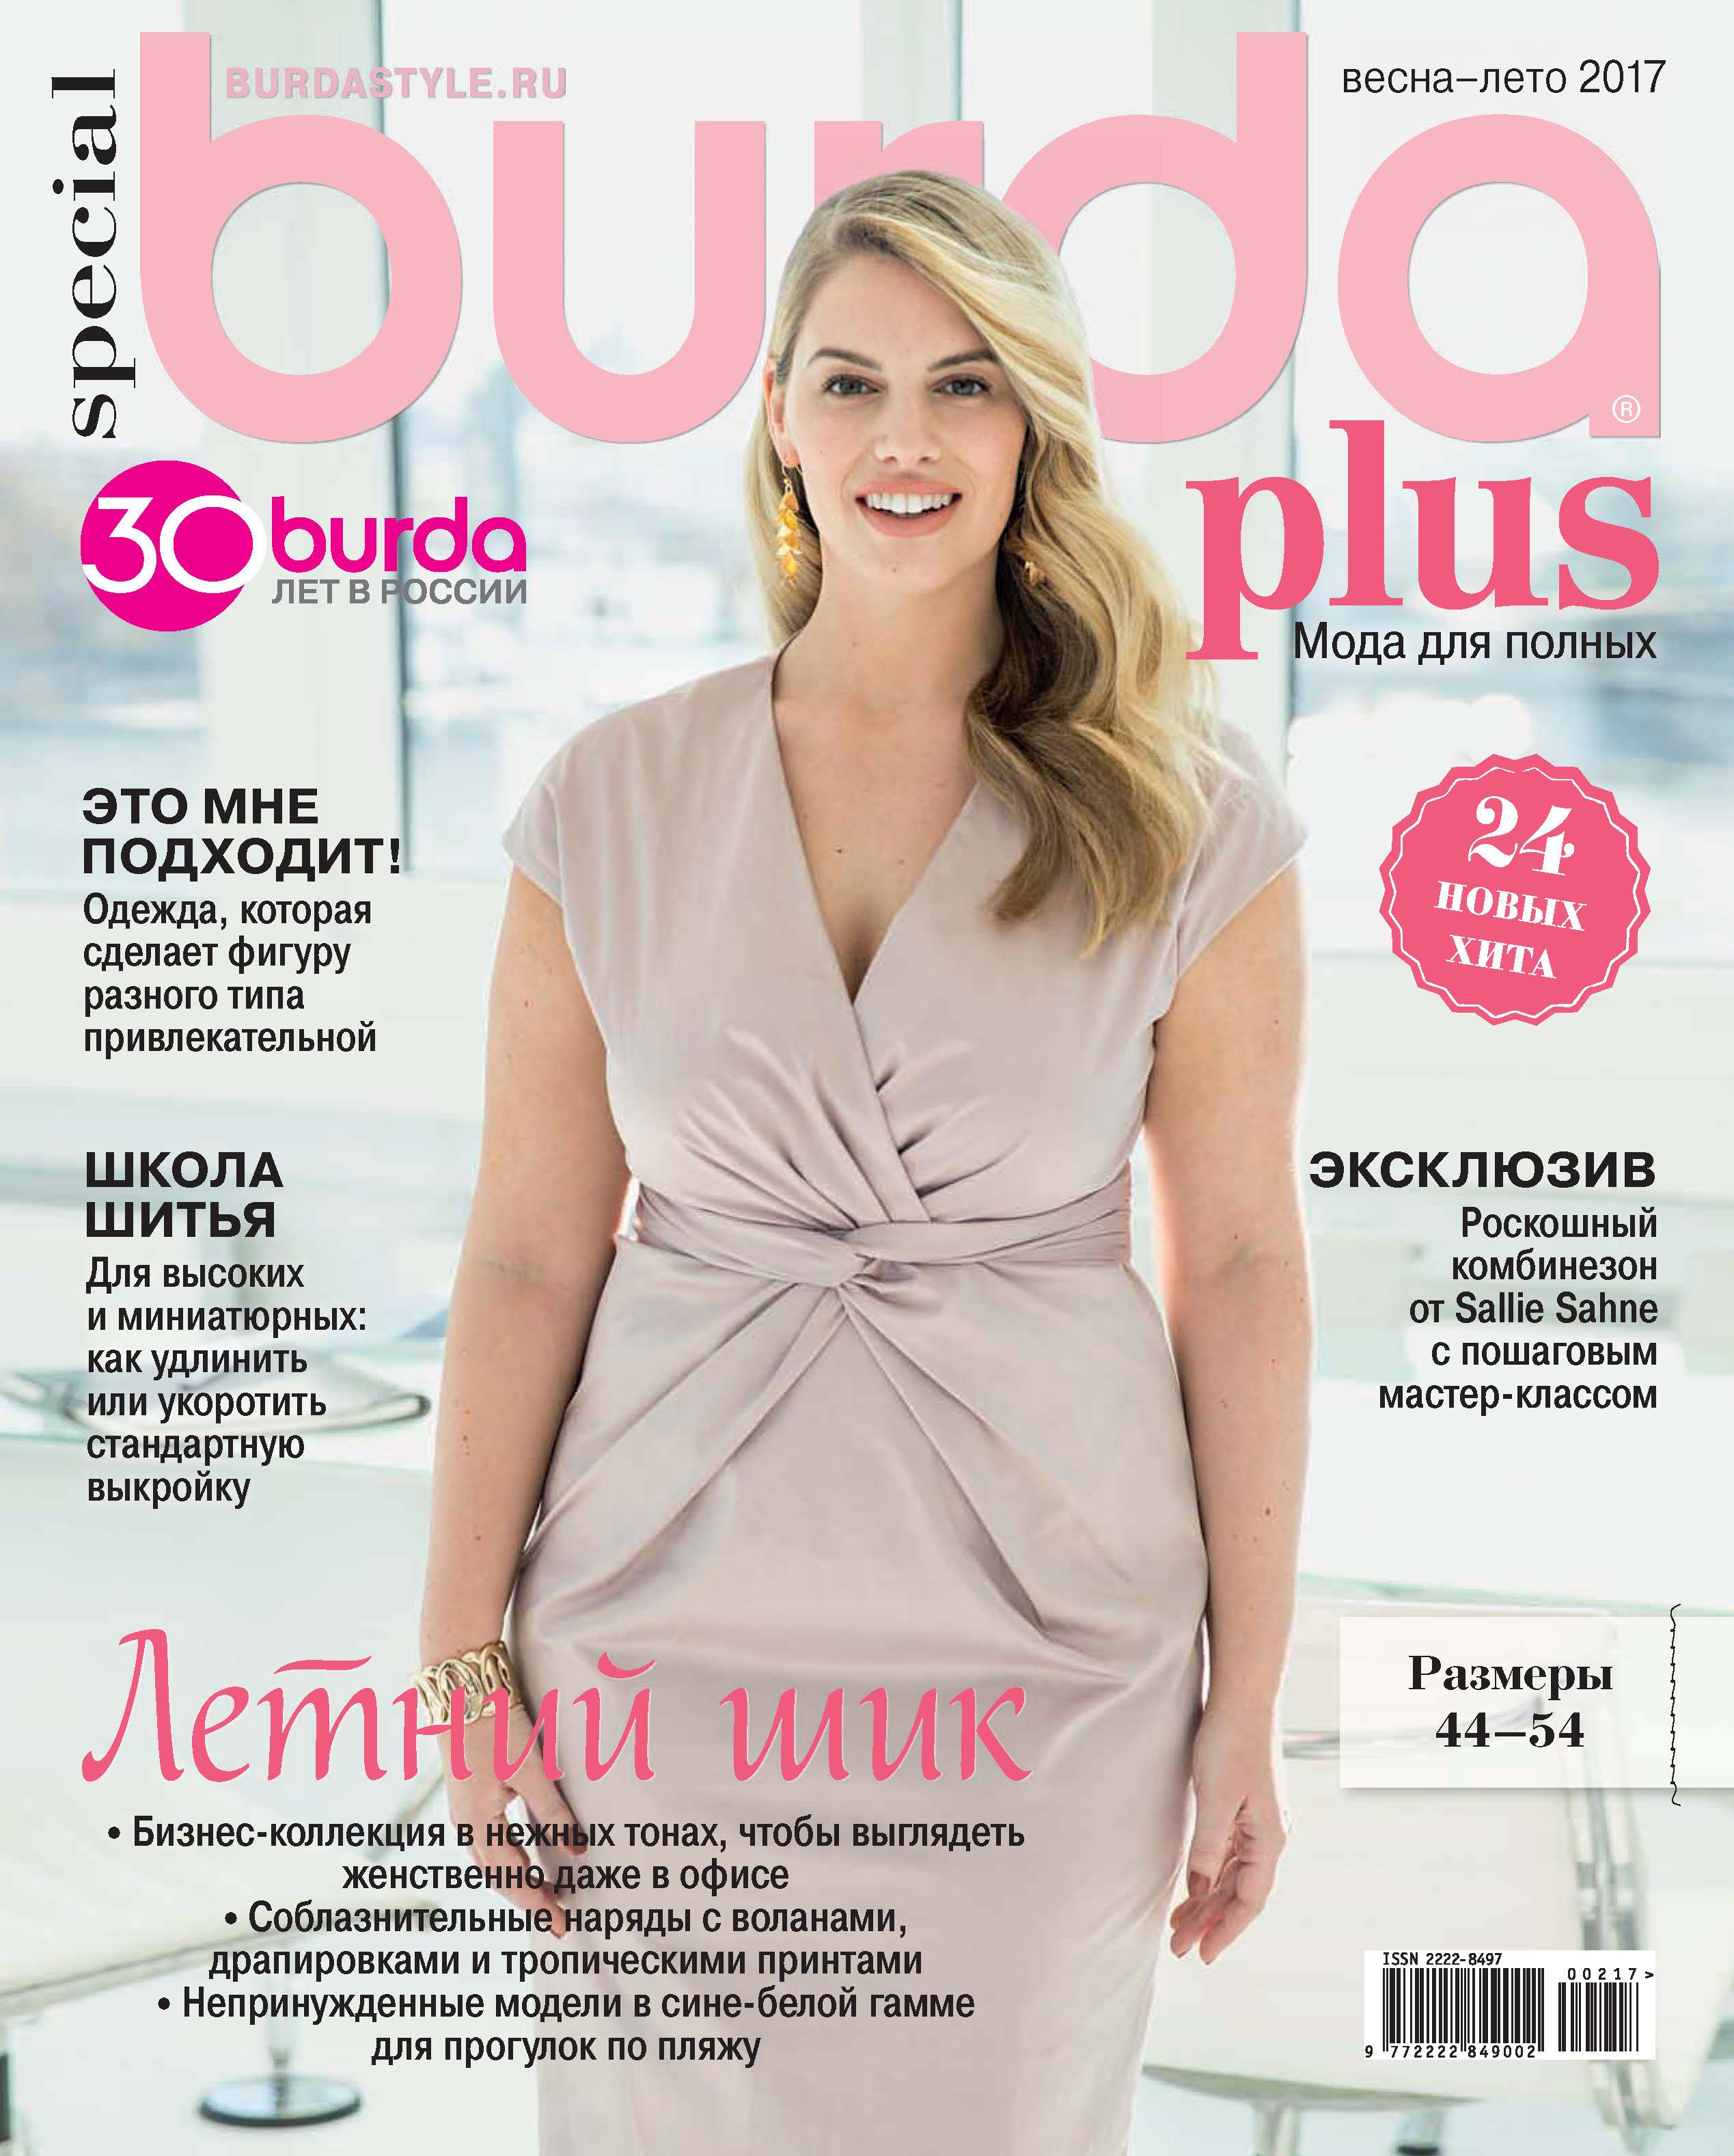 ИД «Бурда» Burda Special №02/2017 ид бурда burda special 02 2017